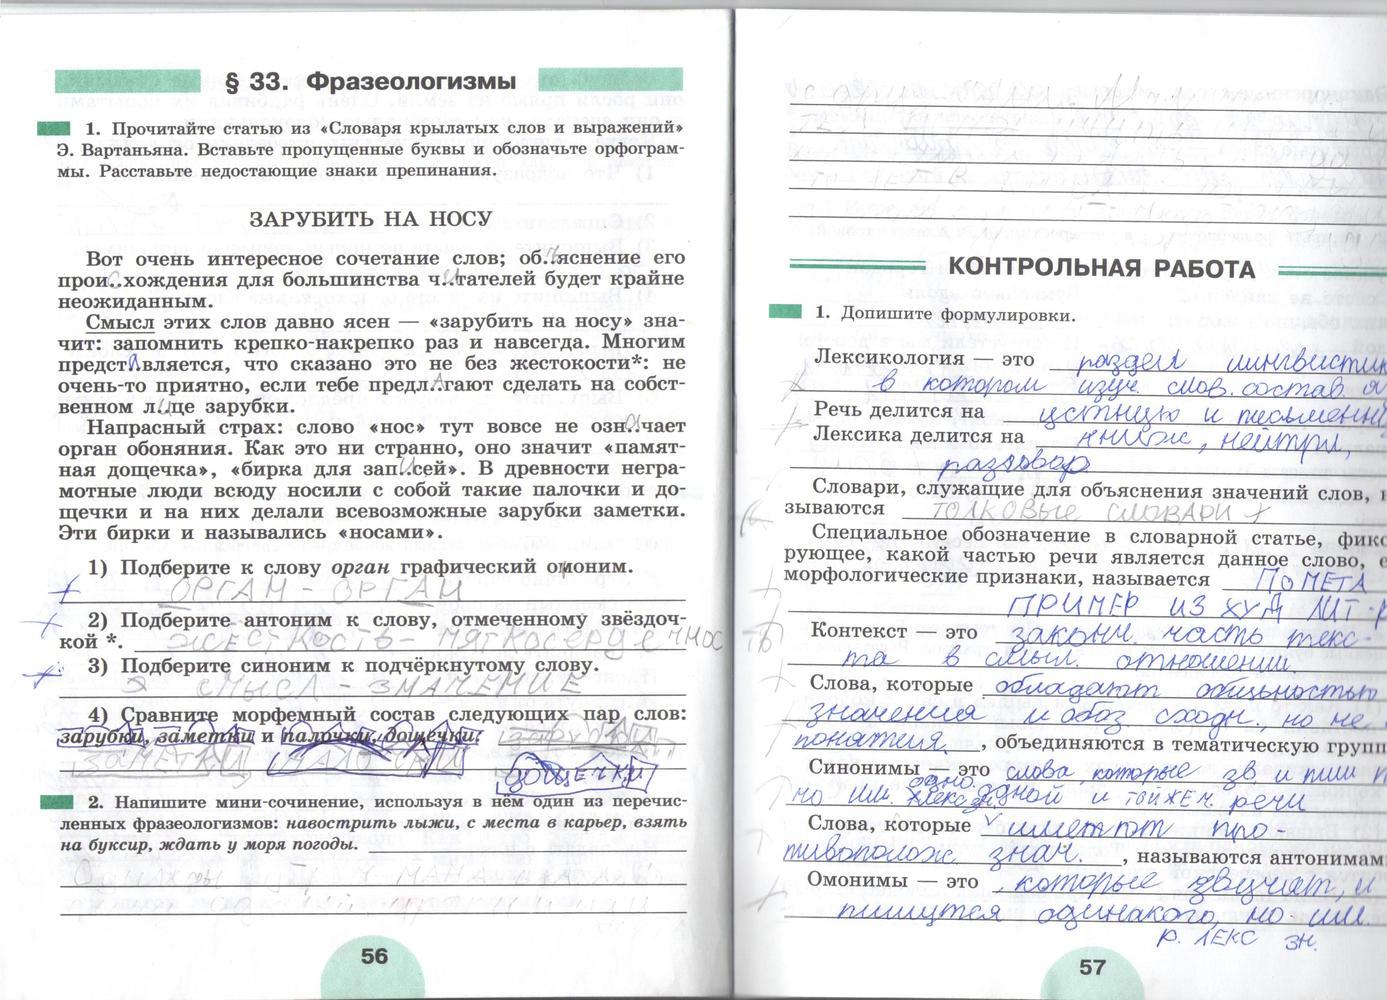 Гдз русский язык 5 класс рыбченкова л. М. Рабочая тетрадь ответы.